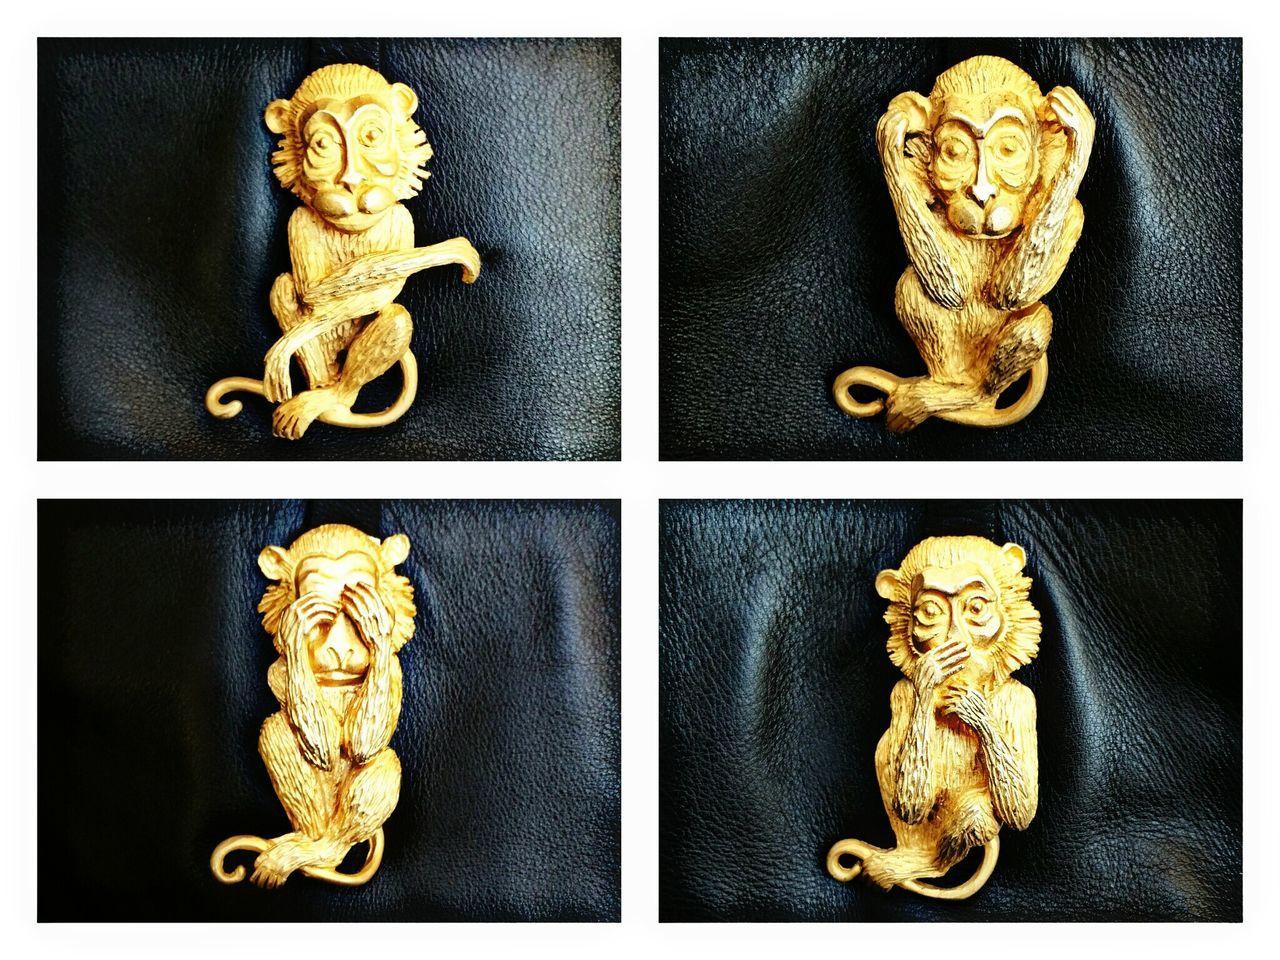 Monkey year!👍🍀💰 Monkey MonkeyYear2016 Gold Valentino Bag Lucky 2016 Goodluck